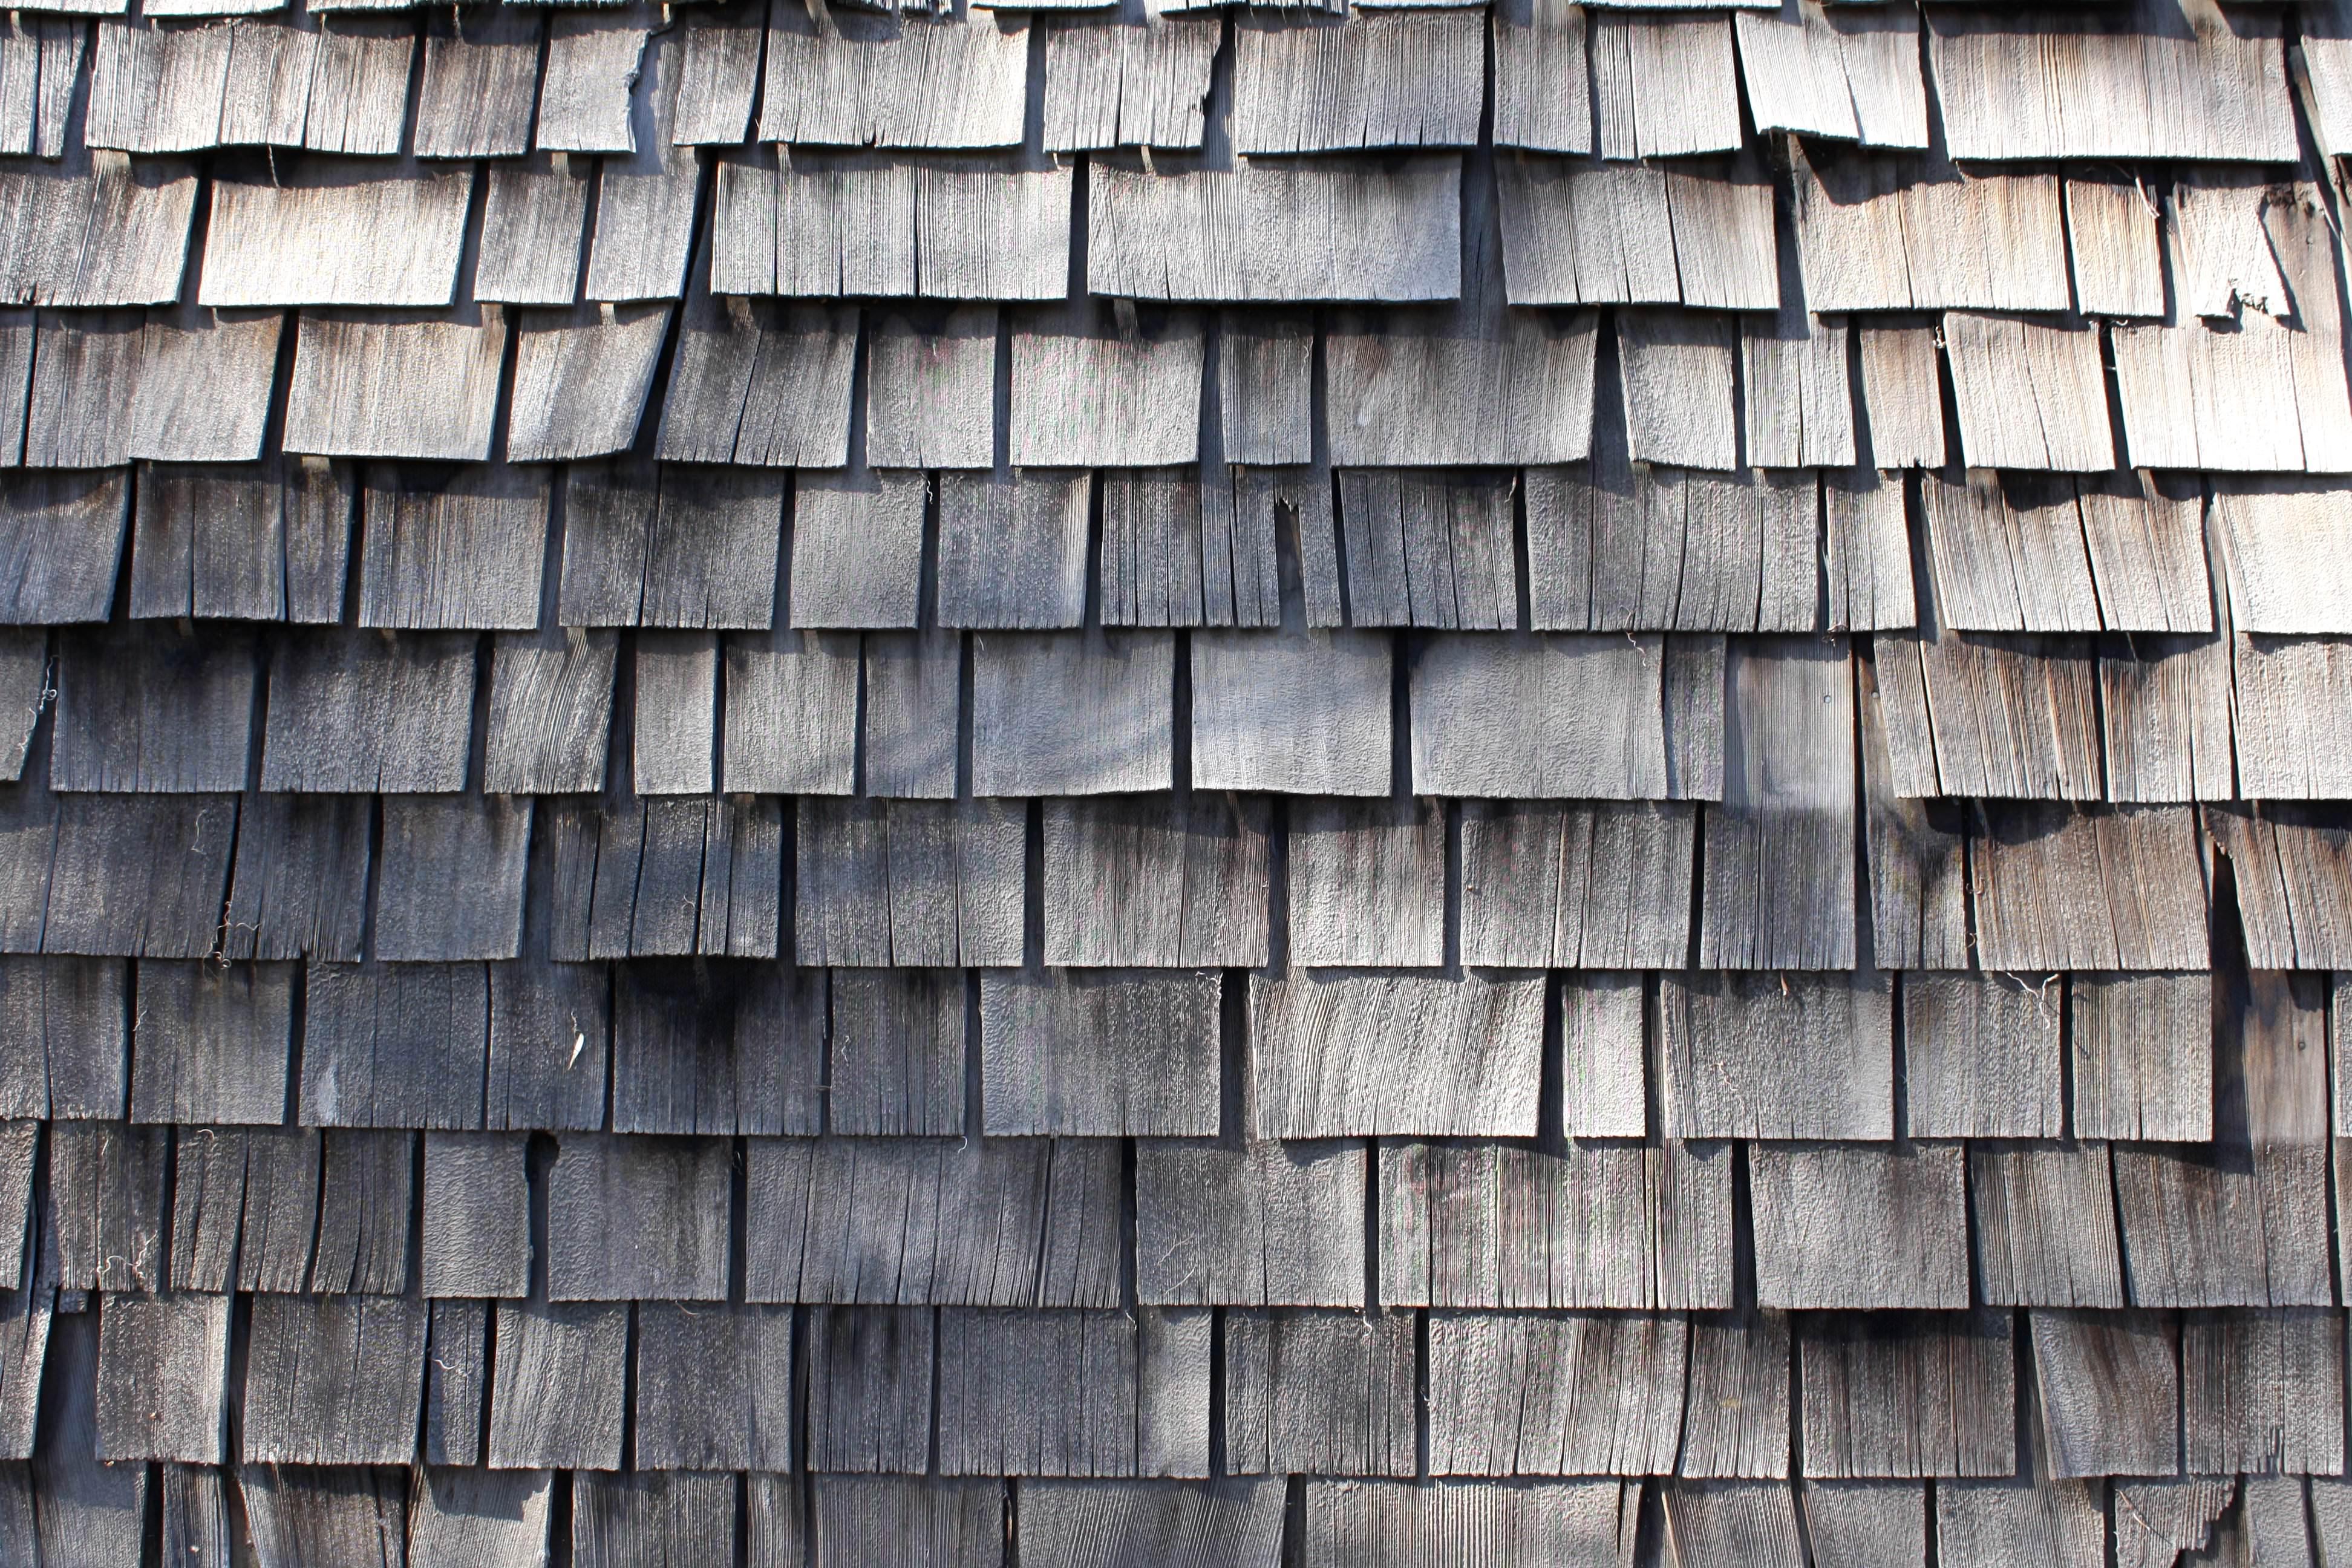 20 Roof Textures Photoshop Textures Freecreatives